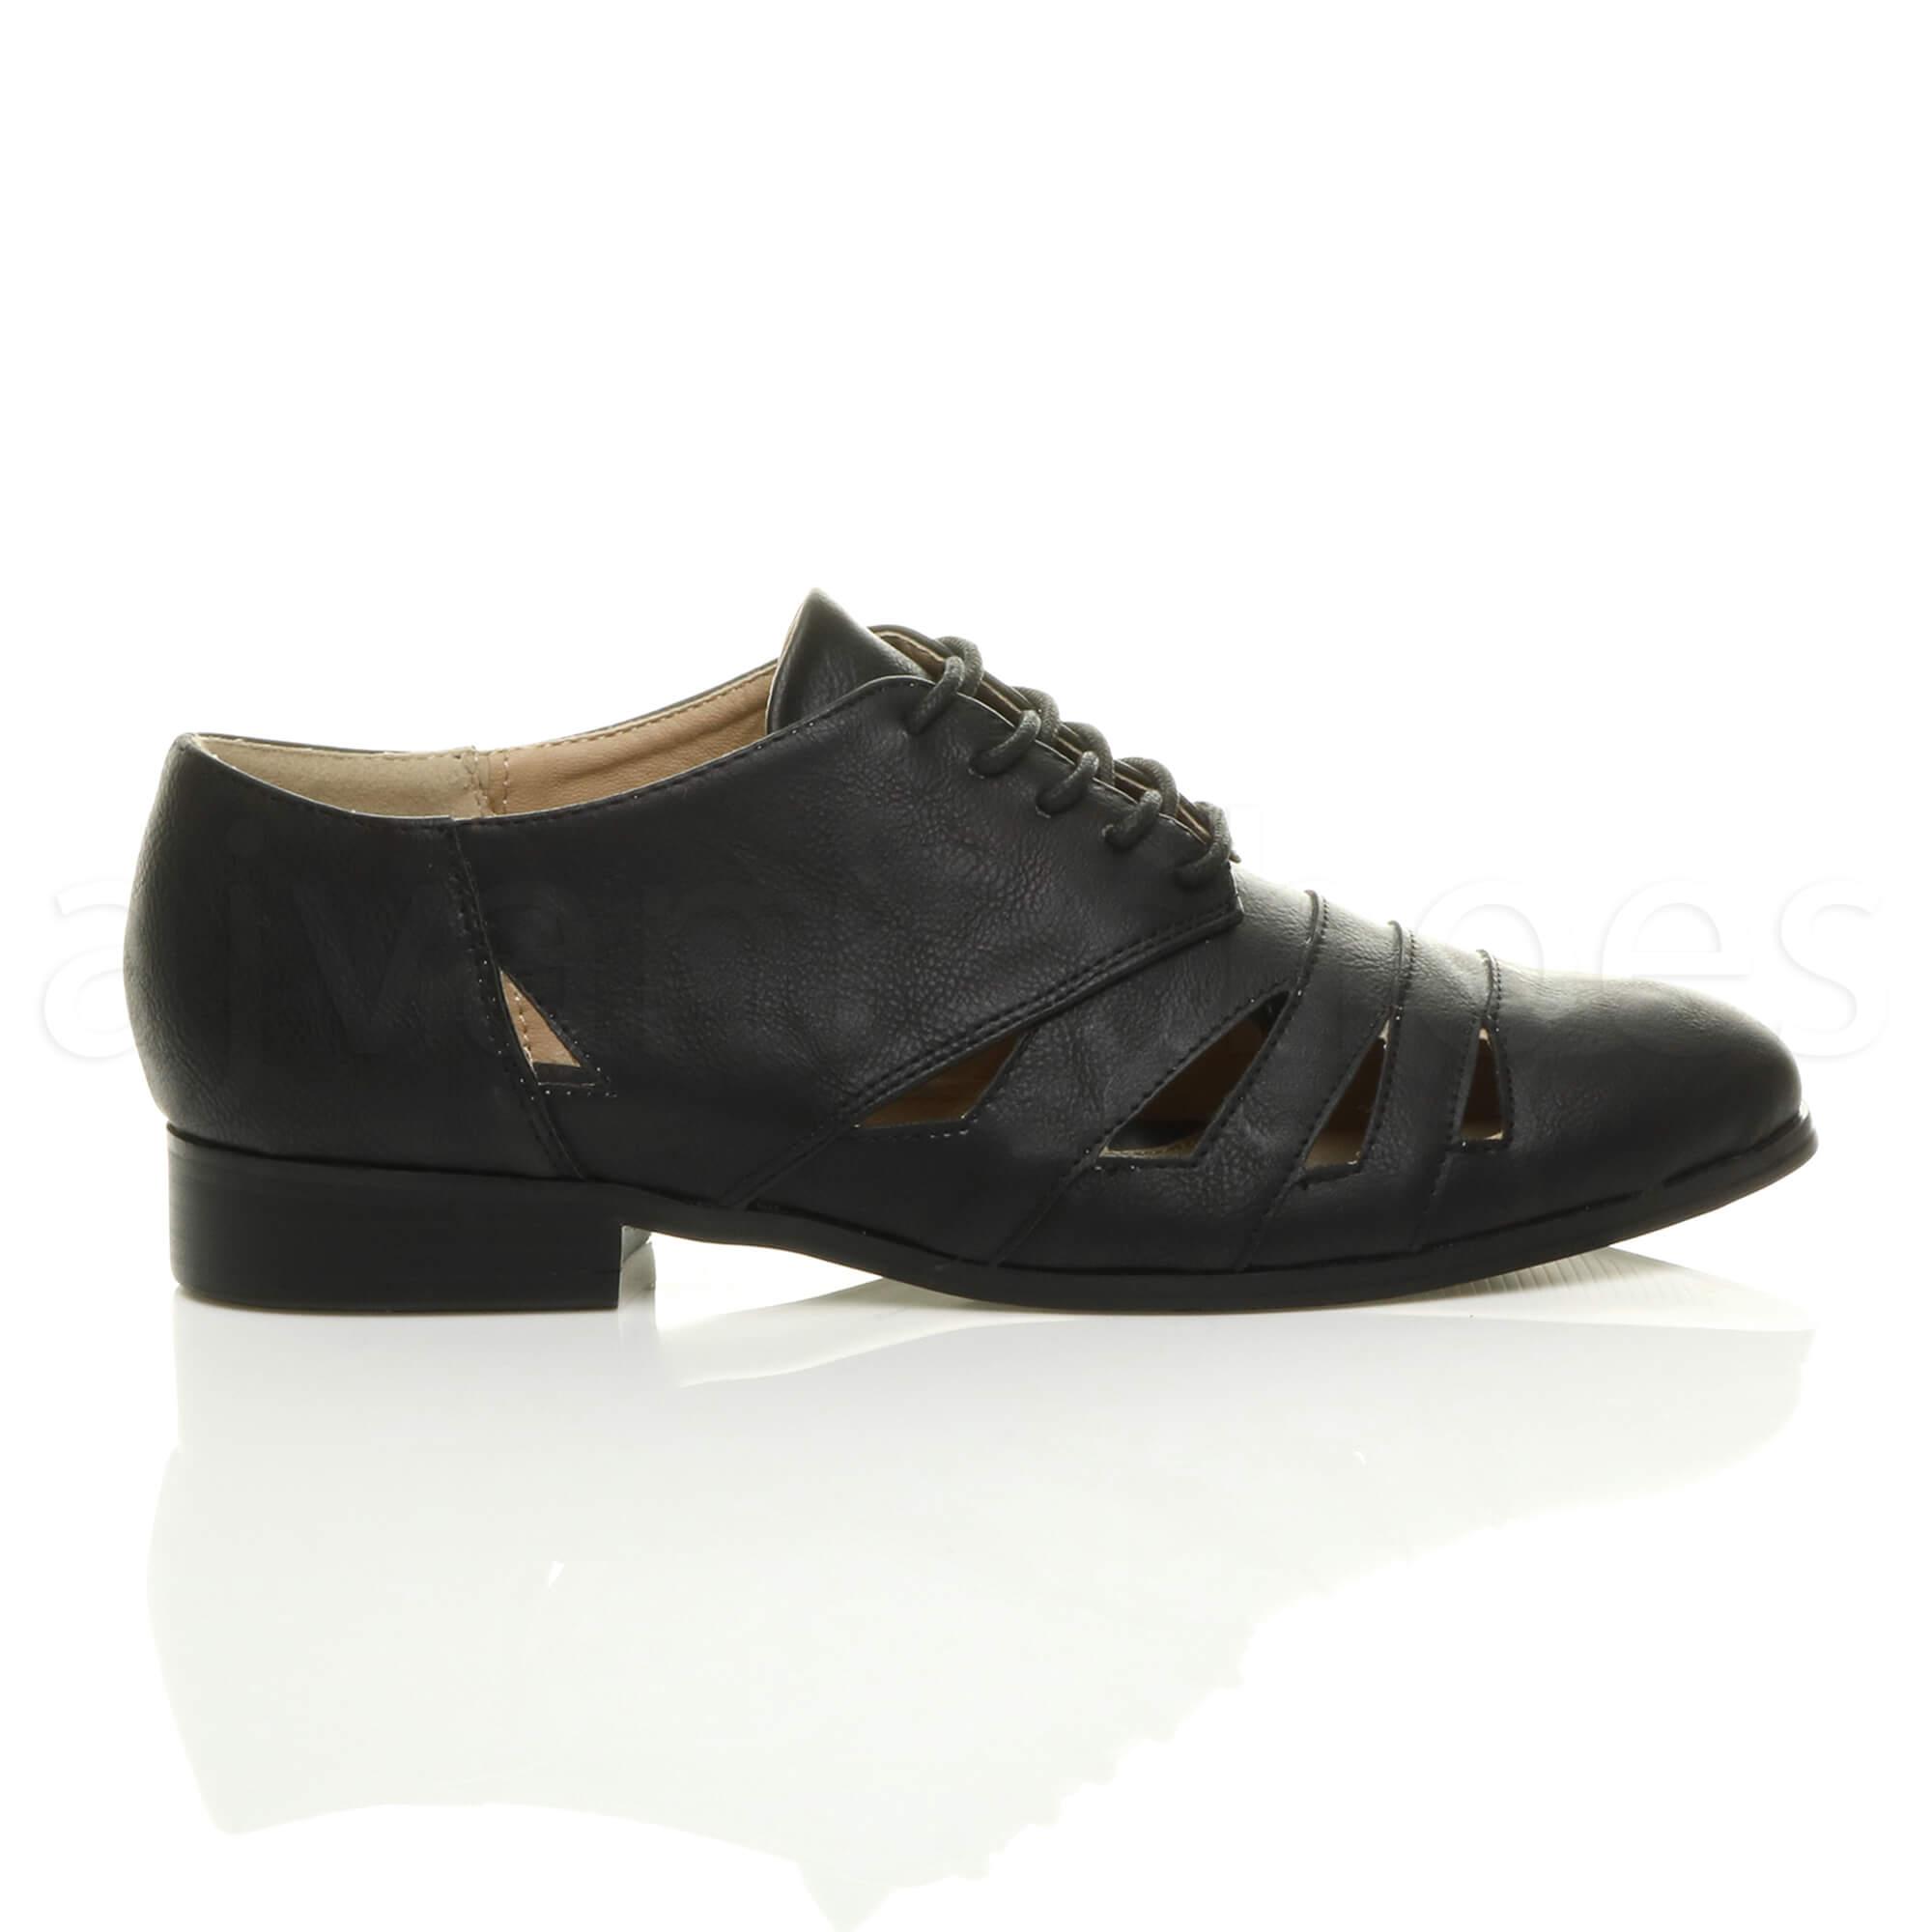 Black Flat Front Lace Up Shoes